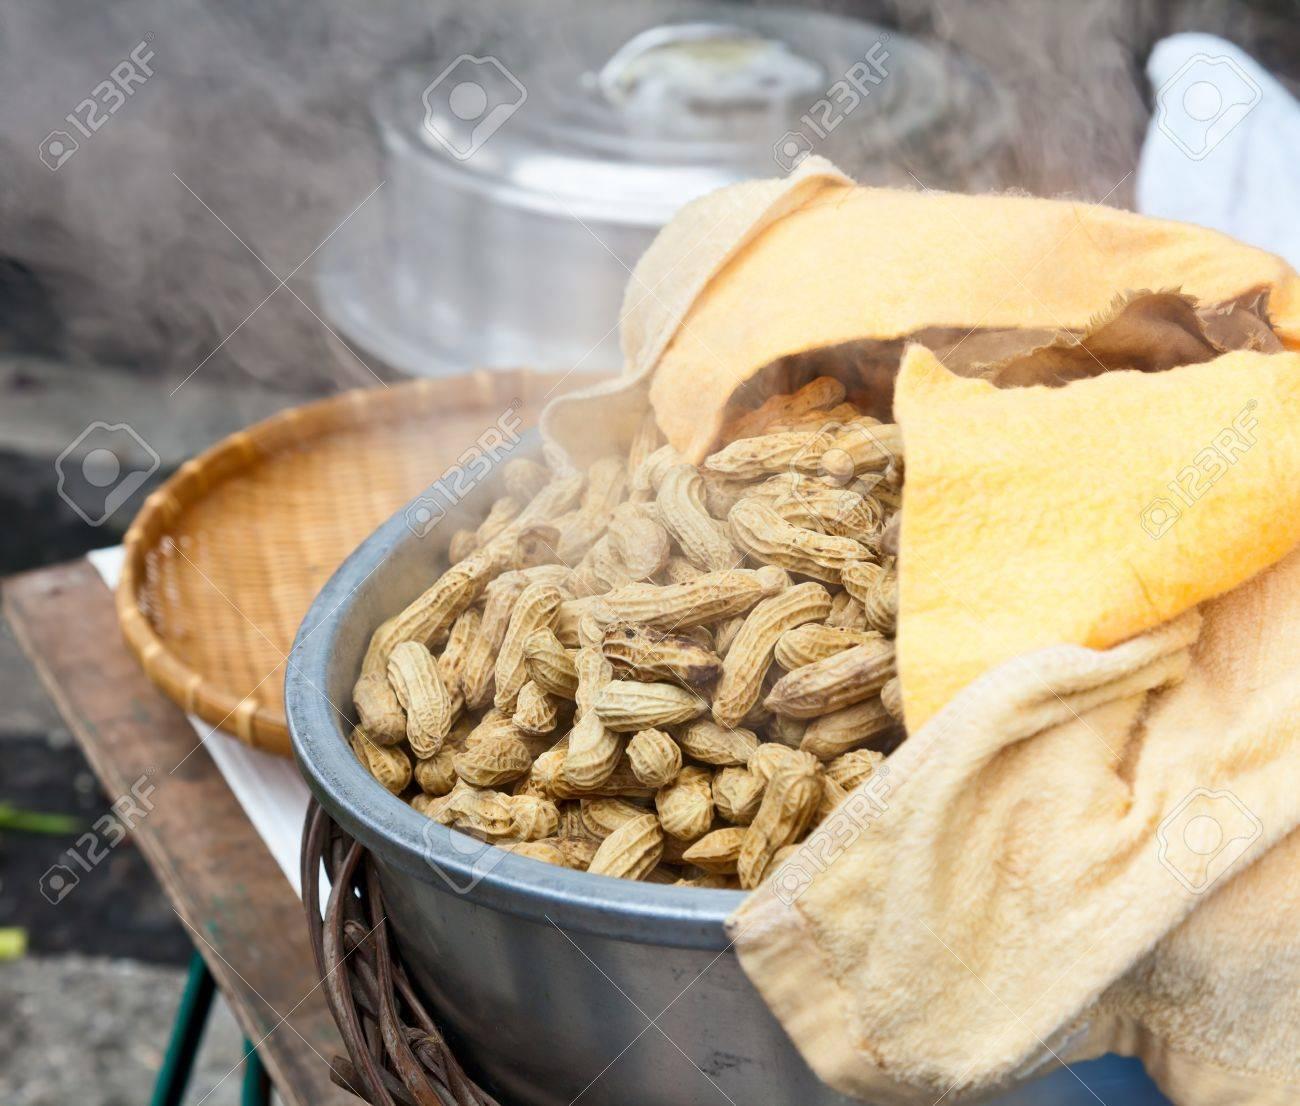 Street food in Taiwan - boiling peanuts Stock Photo - 19264484